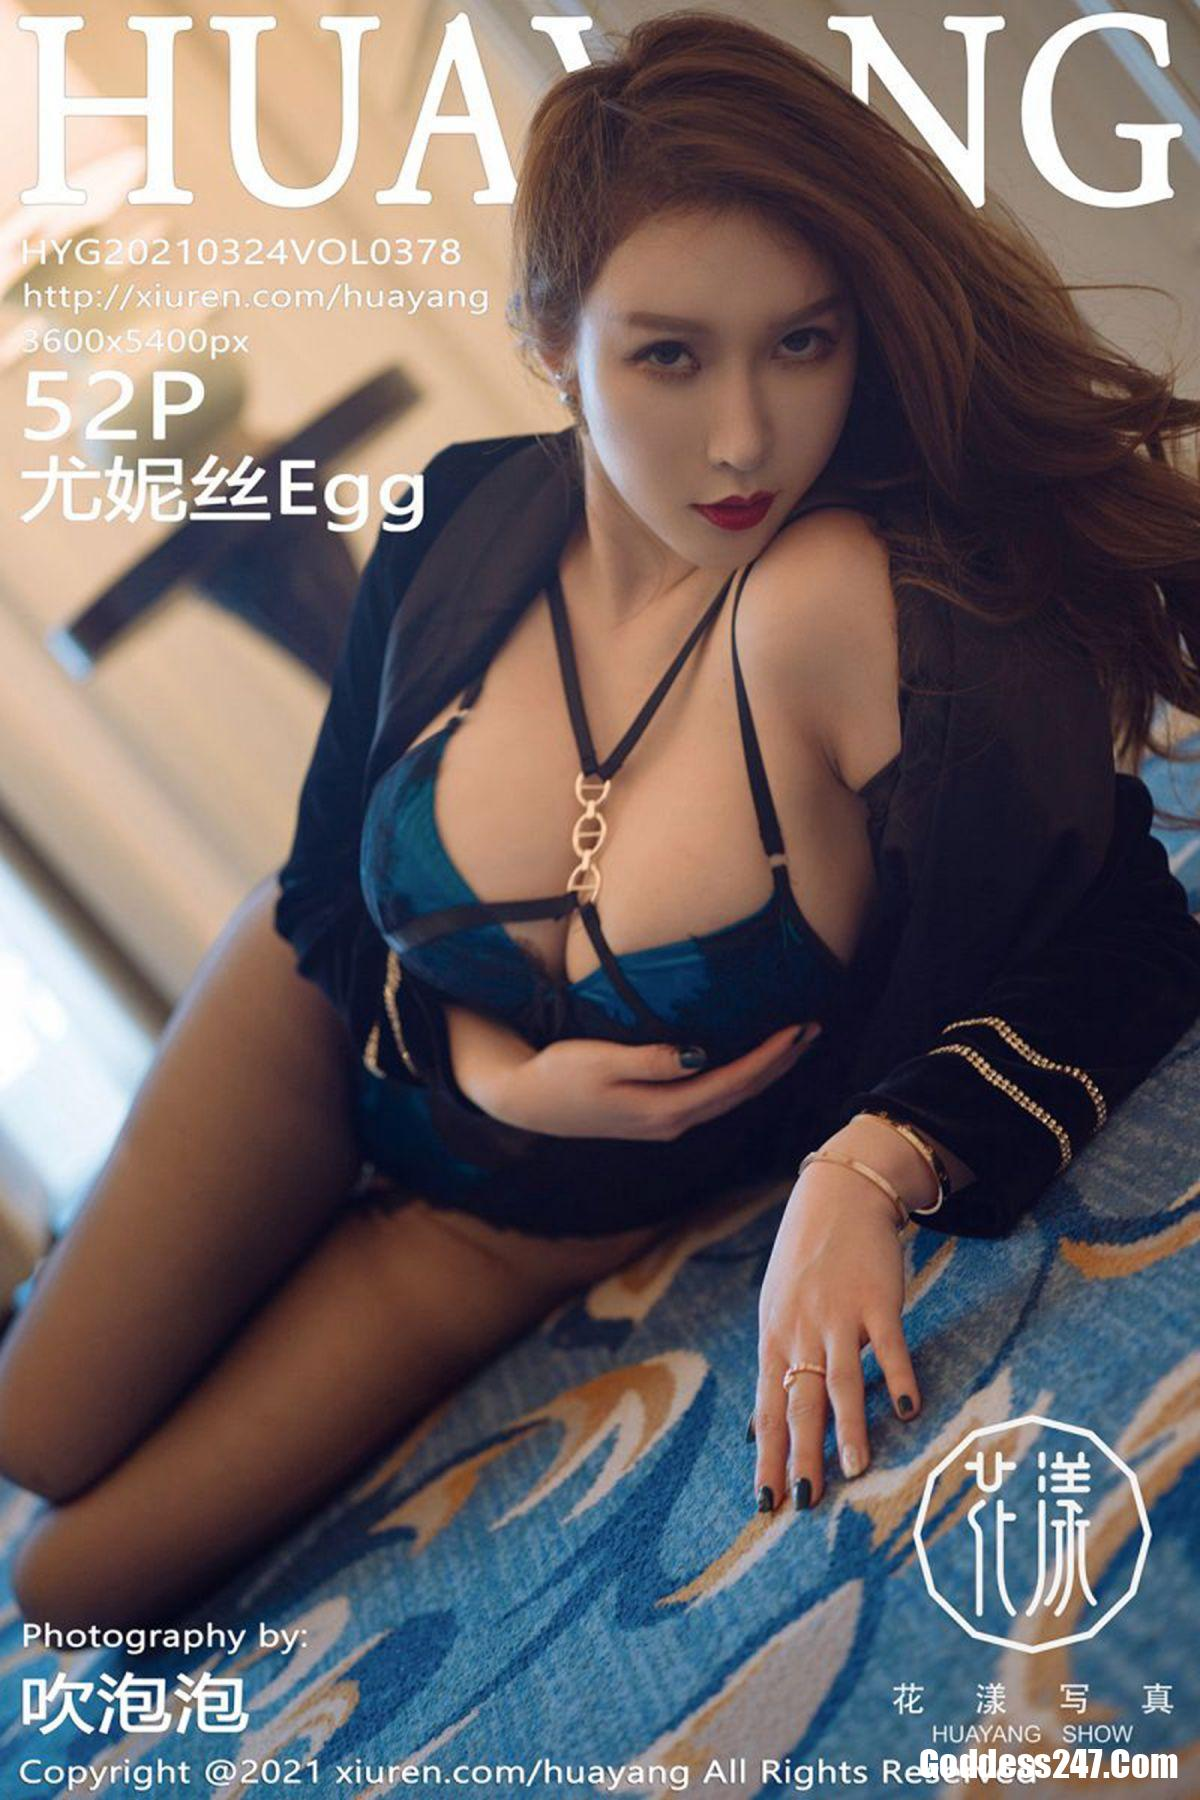 HuaYang花漾Show Vol.378 Egg-尤妮丝Egg